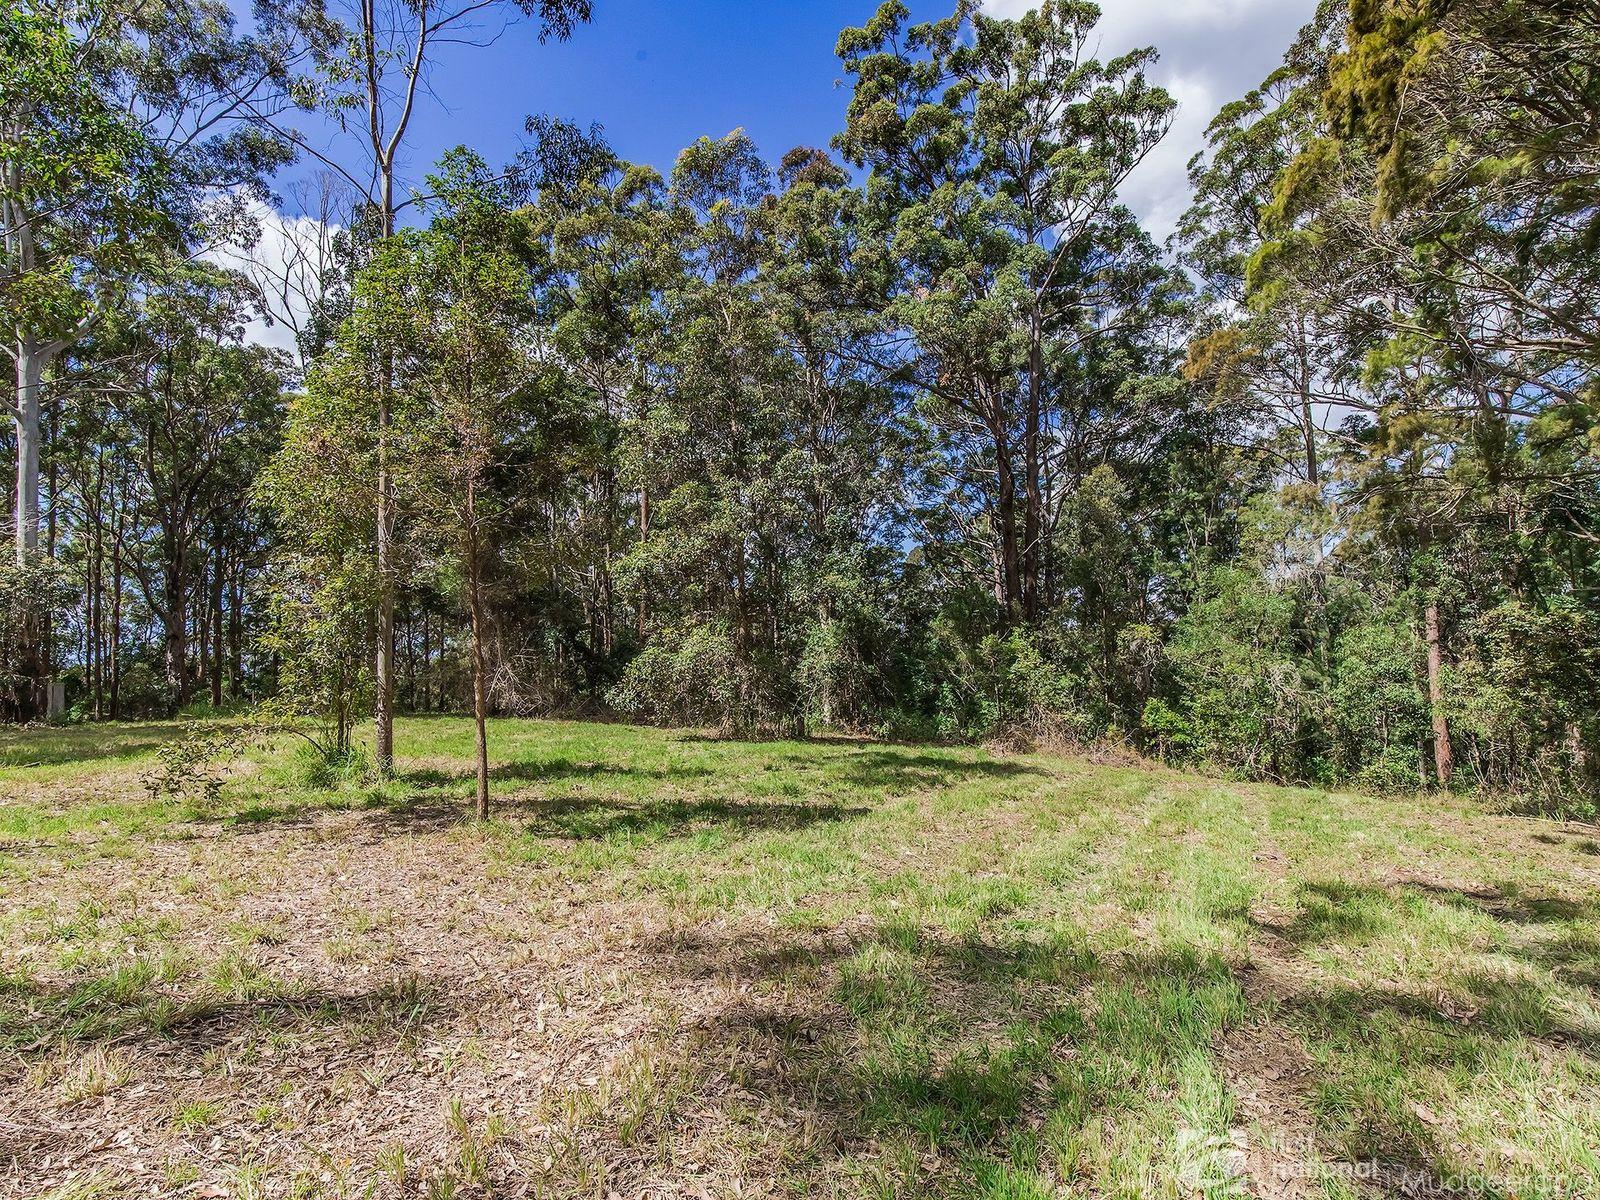 1806 Gold Coast Springbrook Road, Springbrook, QLD 4213